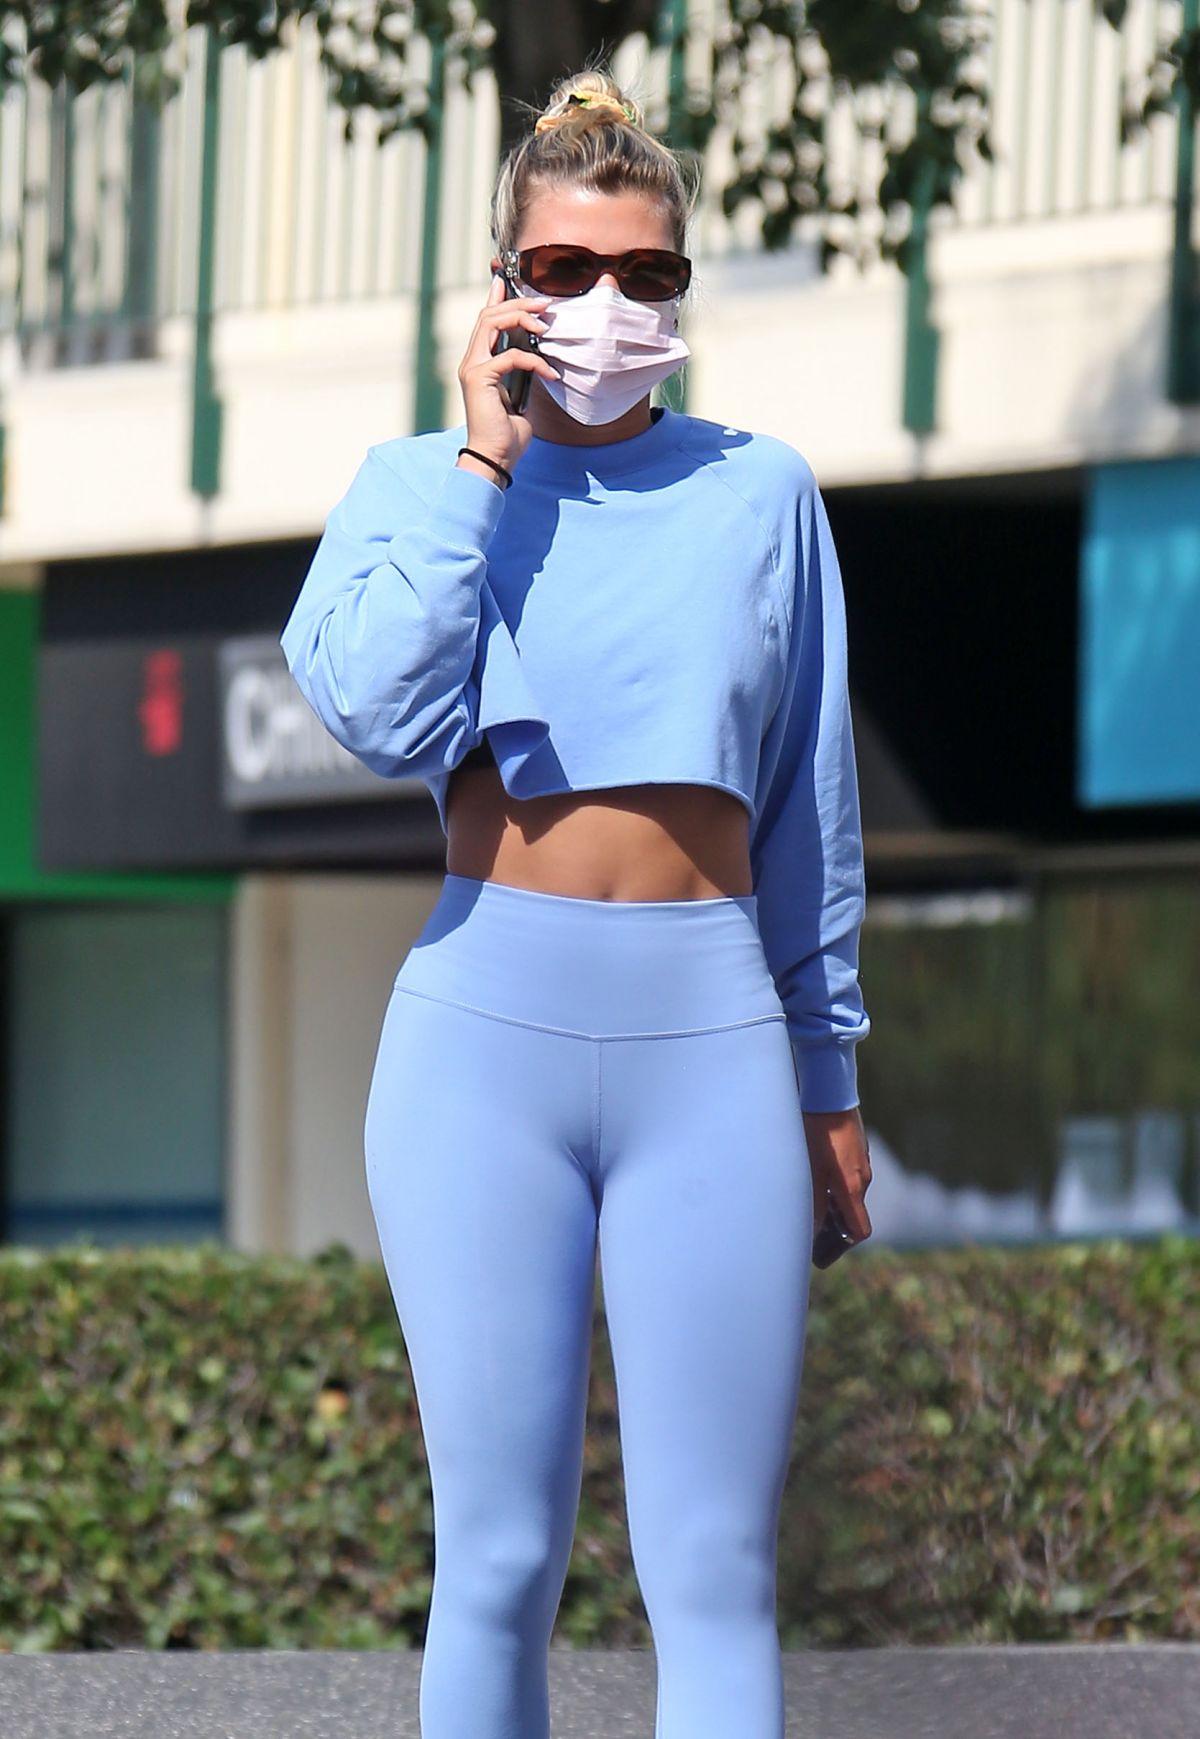 Sofia Richie Heading To Yoga Class Sunset Plaza